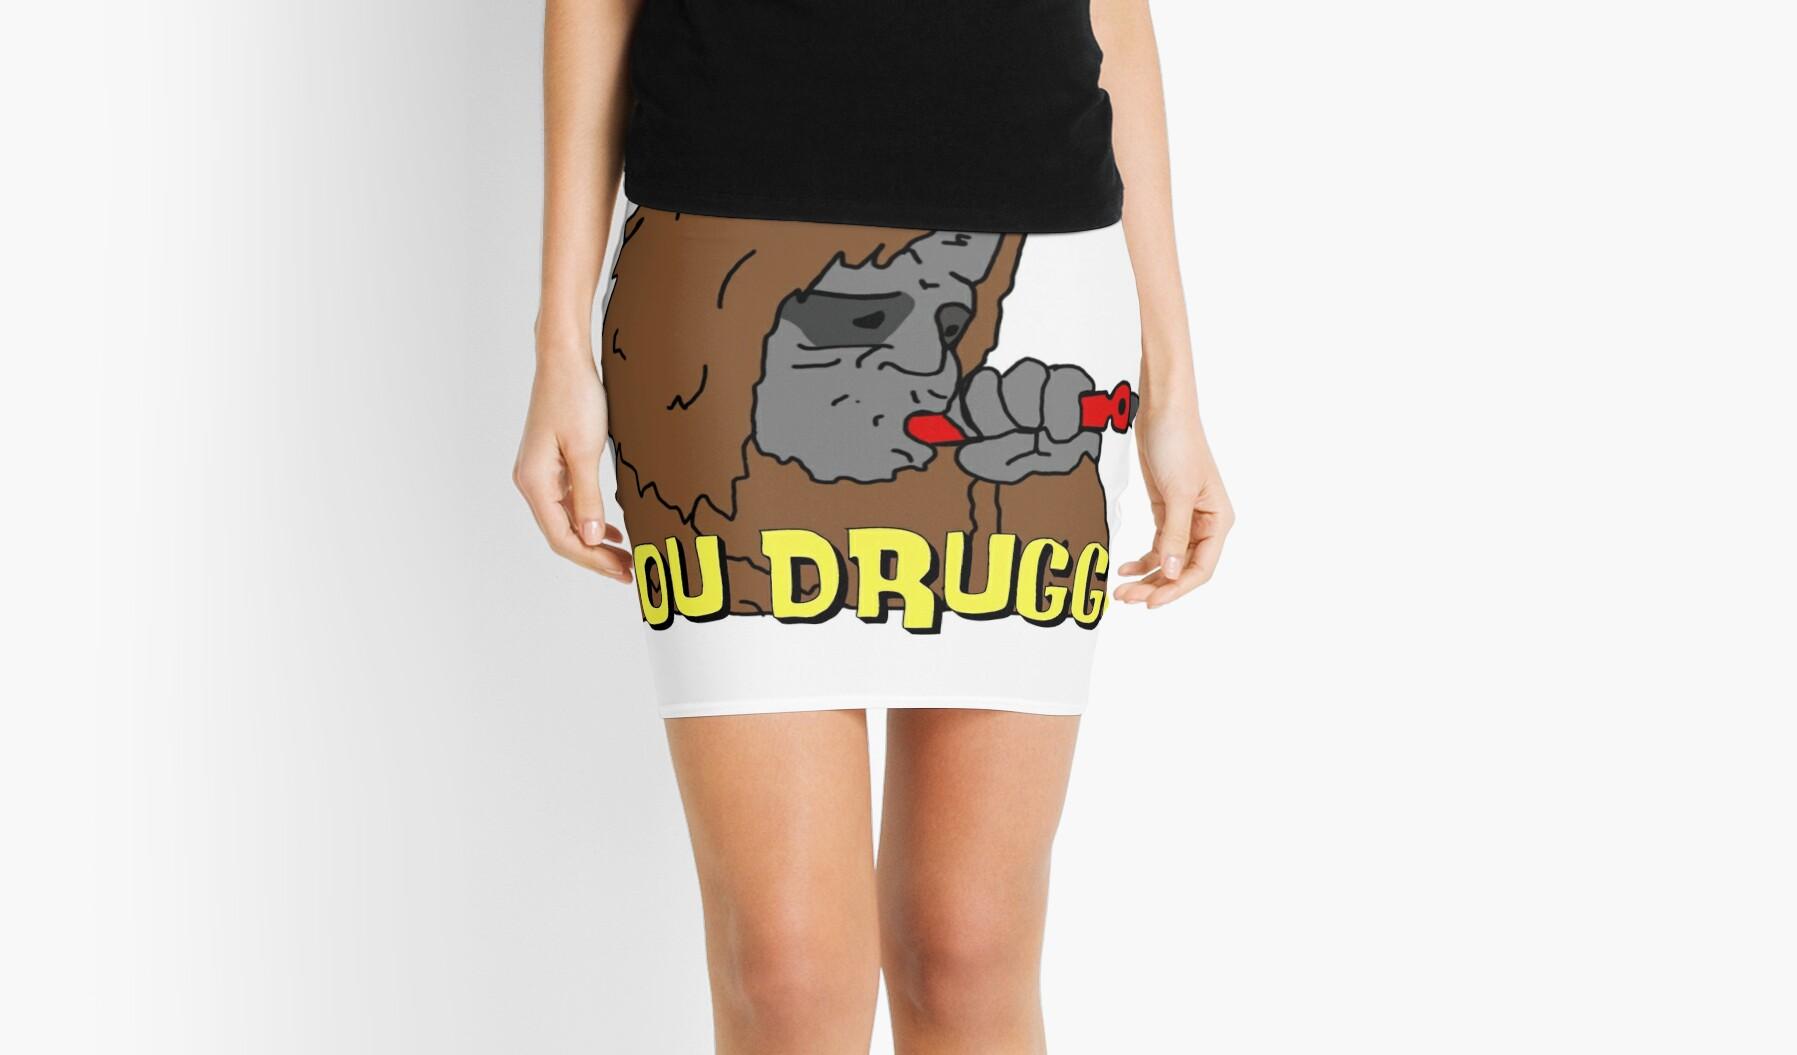 Big Lez Show - You Druggou0026quot; Mini Skirts by Ajayyyy : Redbubble